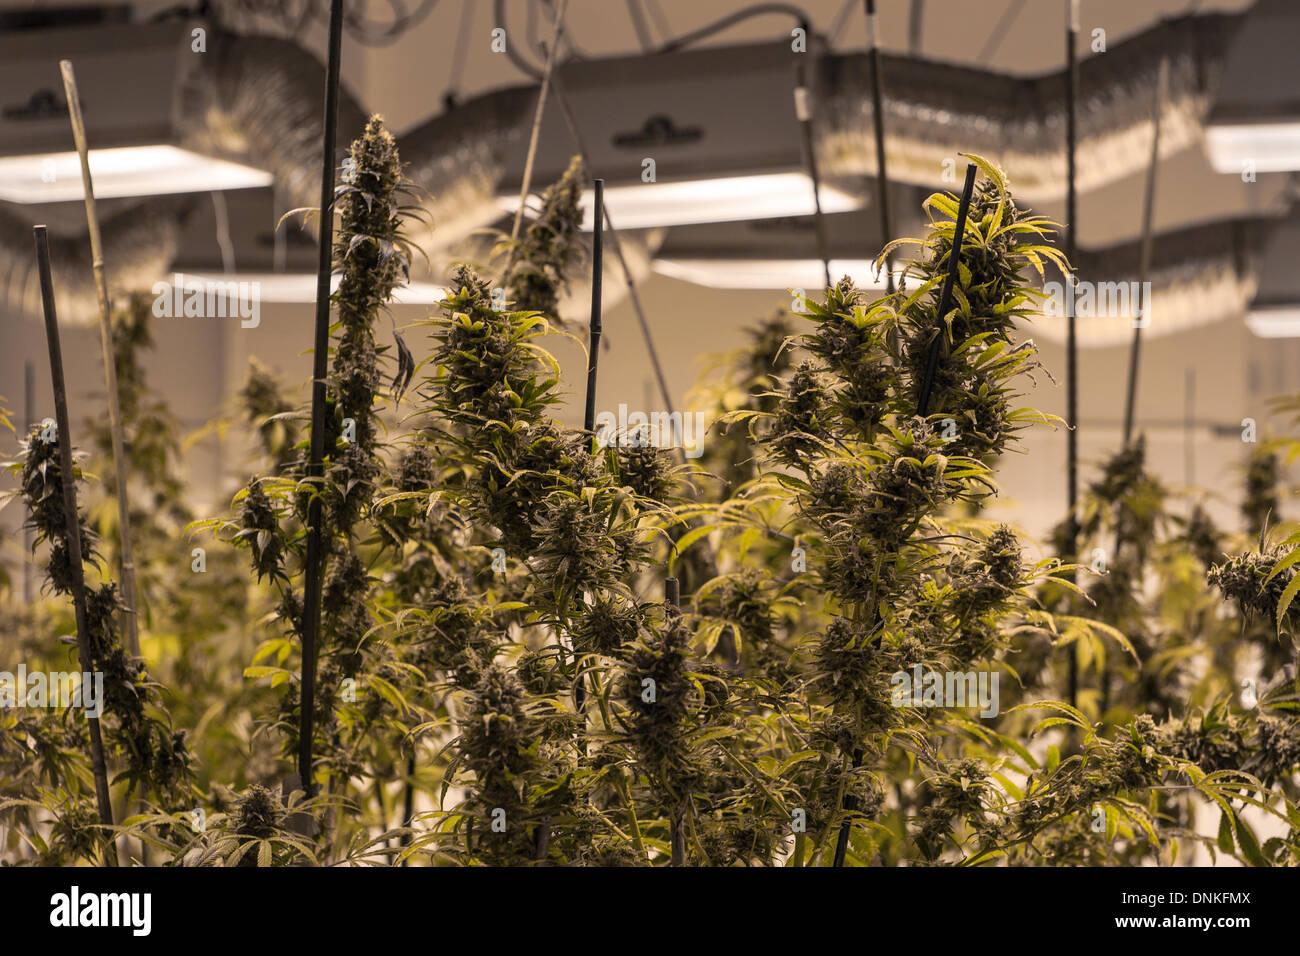 Marijuana chatroom